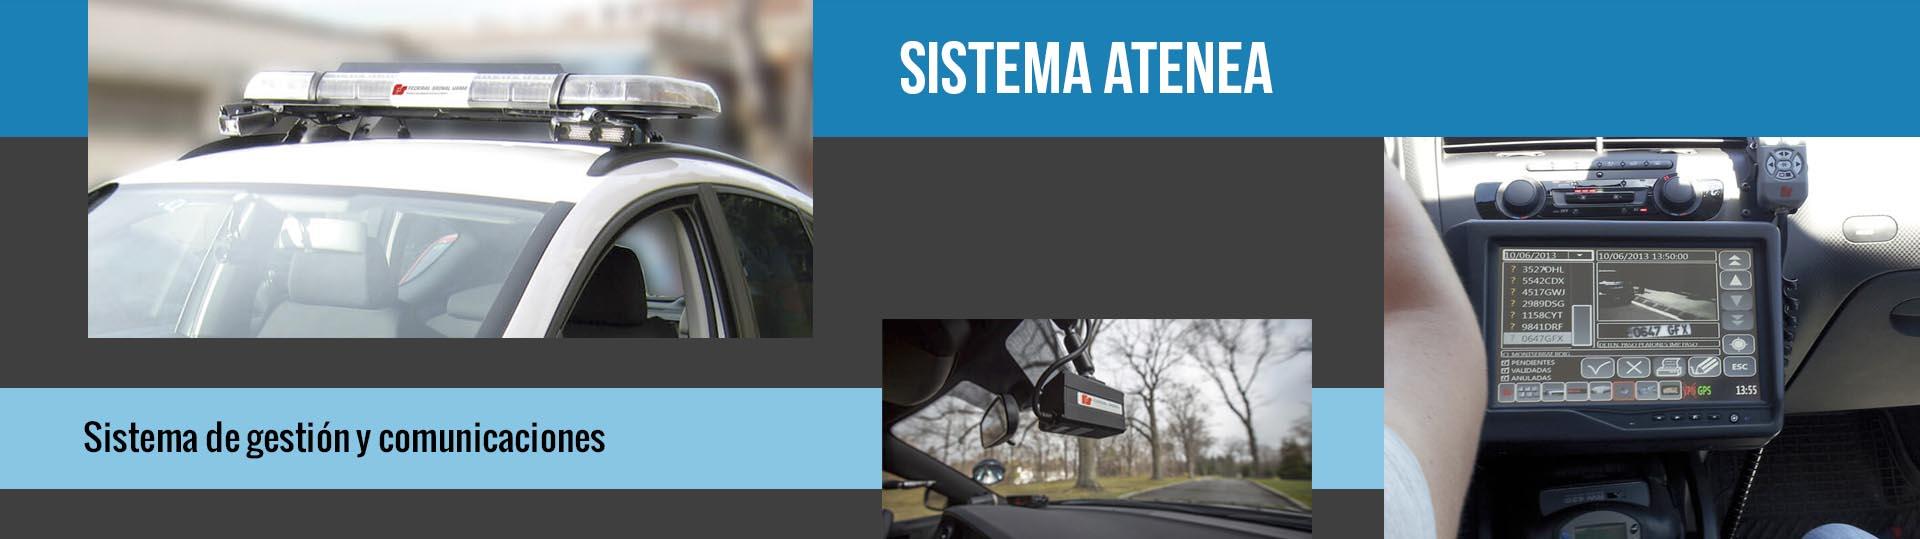 slider-sistema-atenea-copia